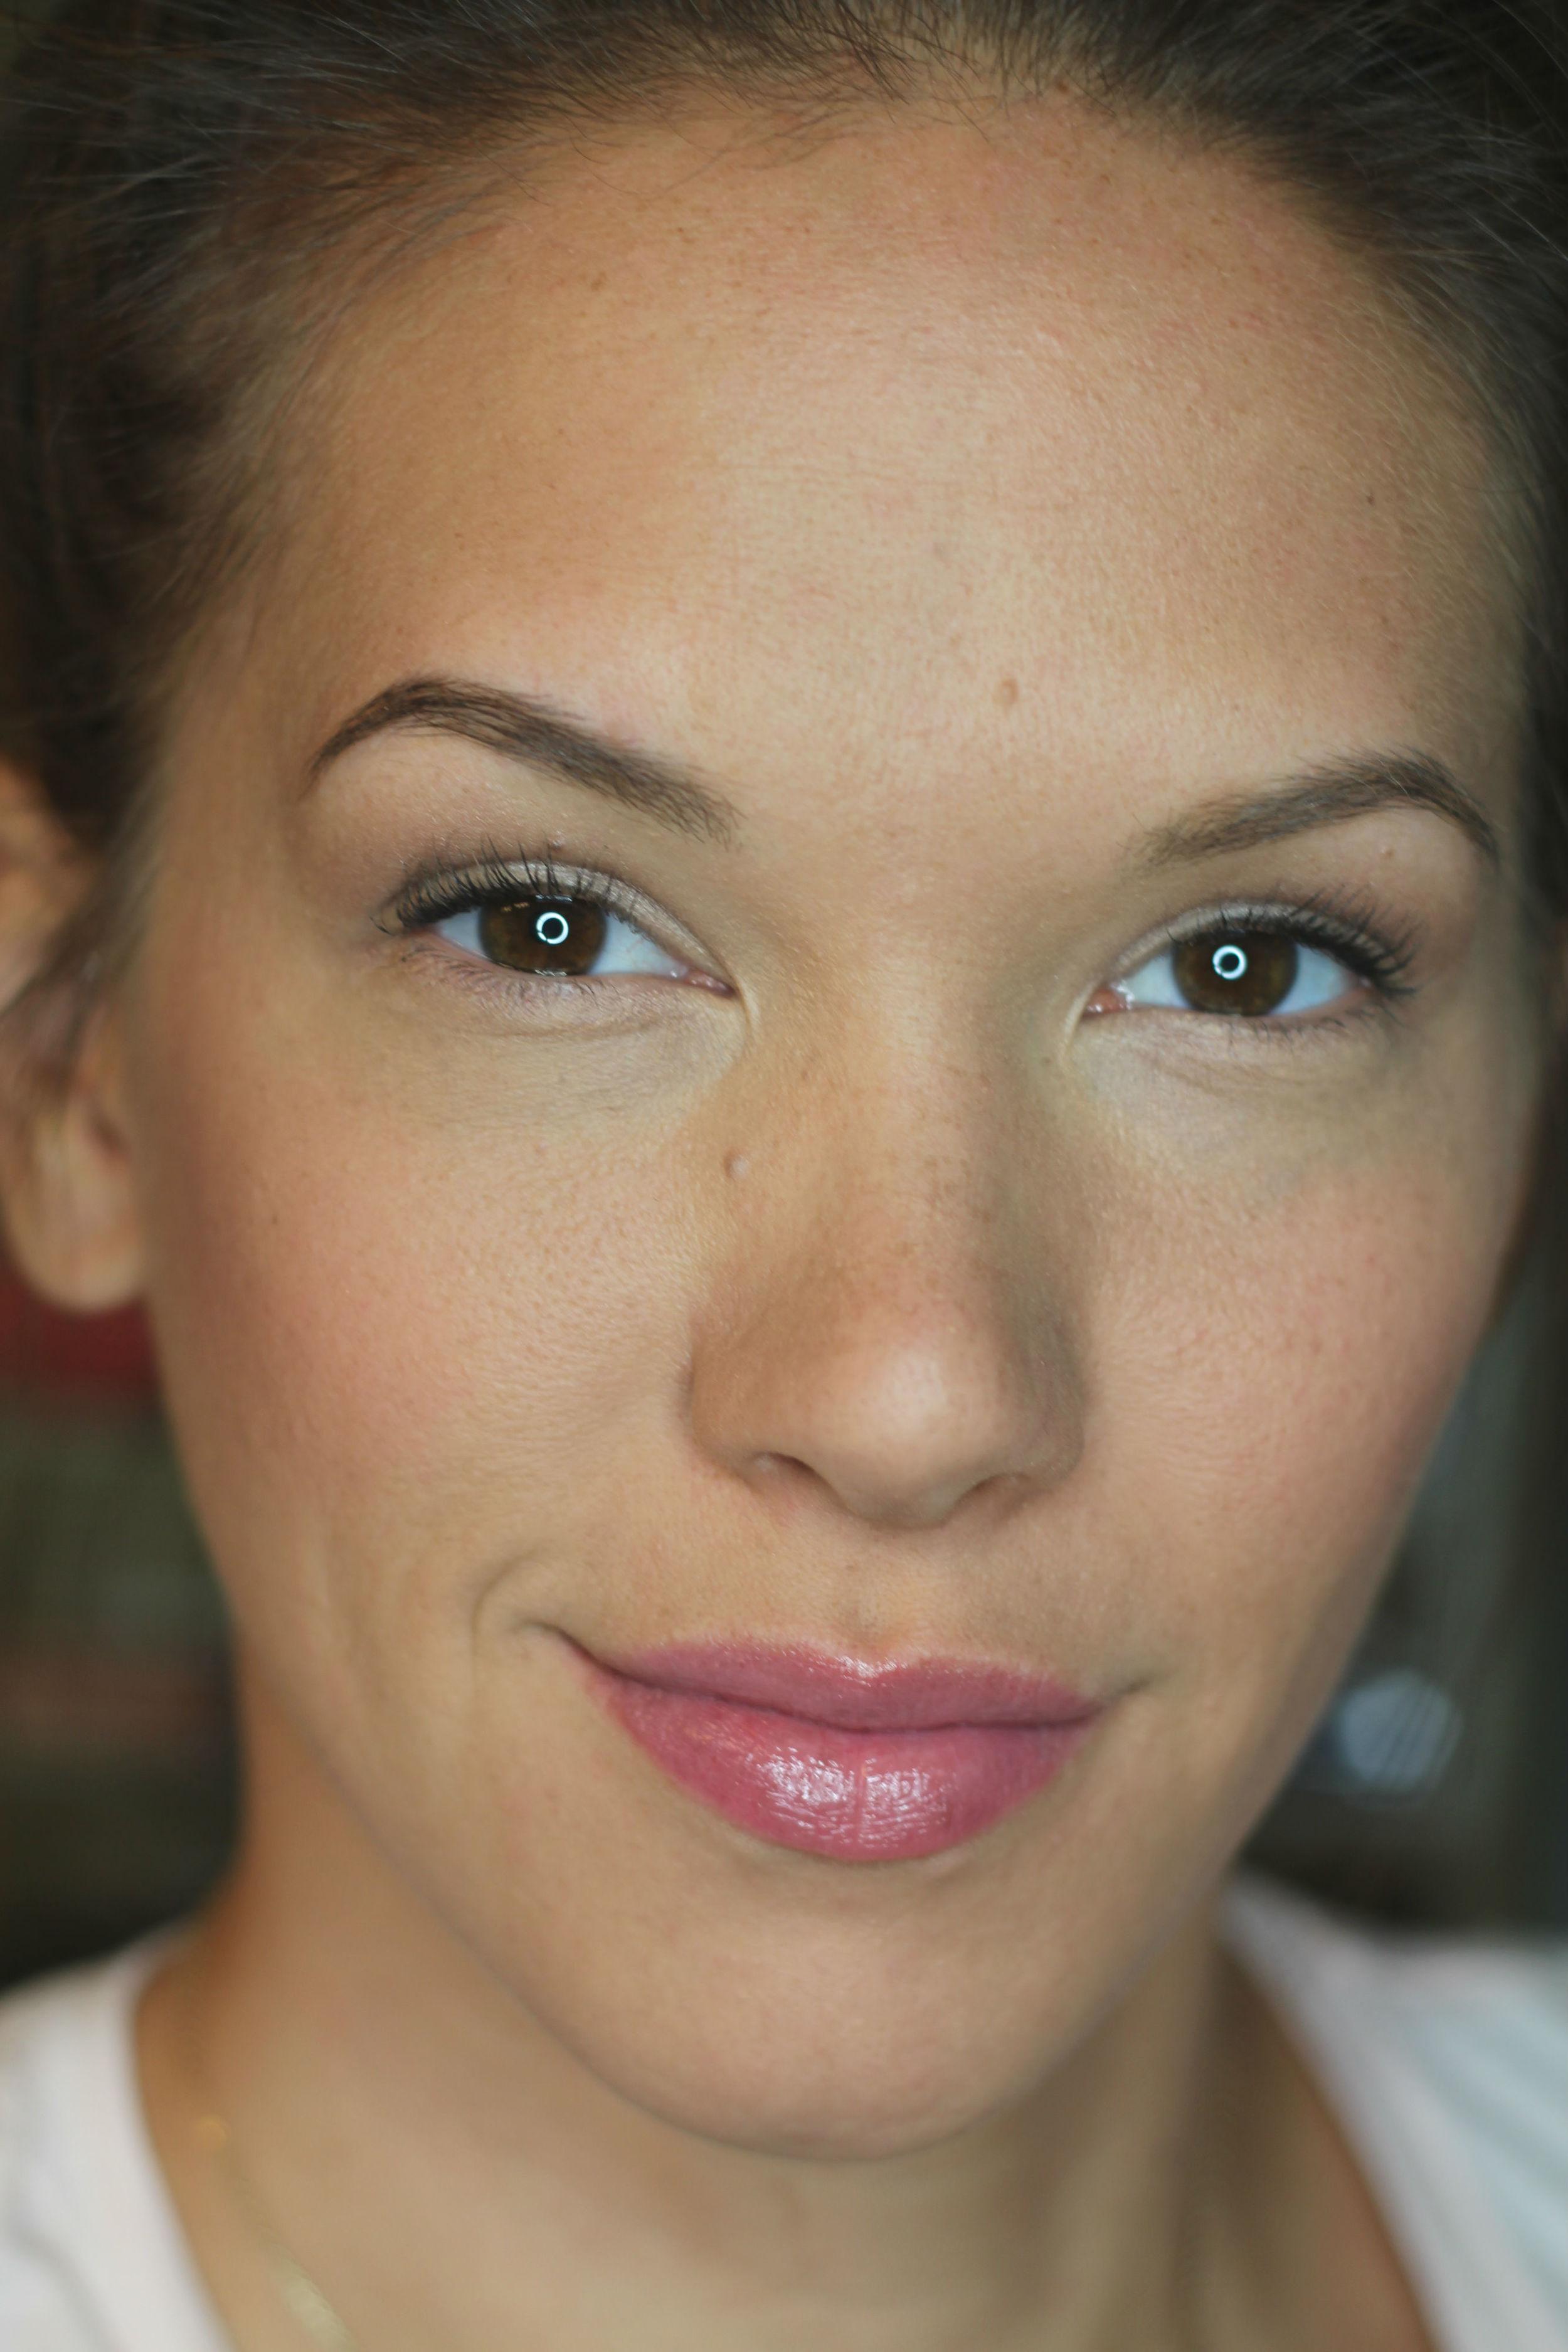 Regular Makeup Application without any highlight or contour.